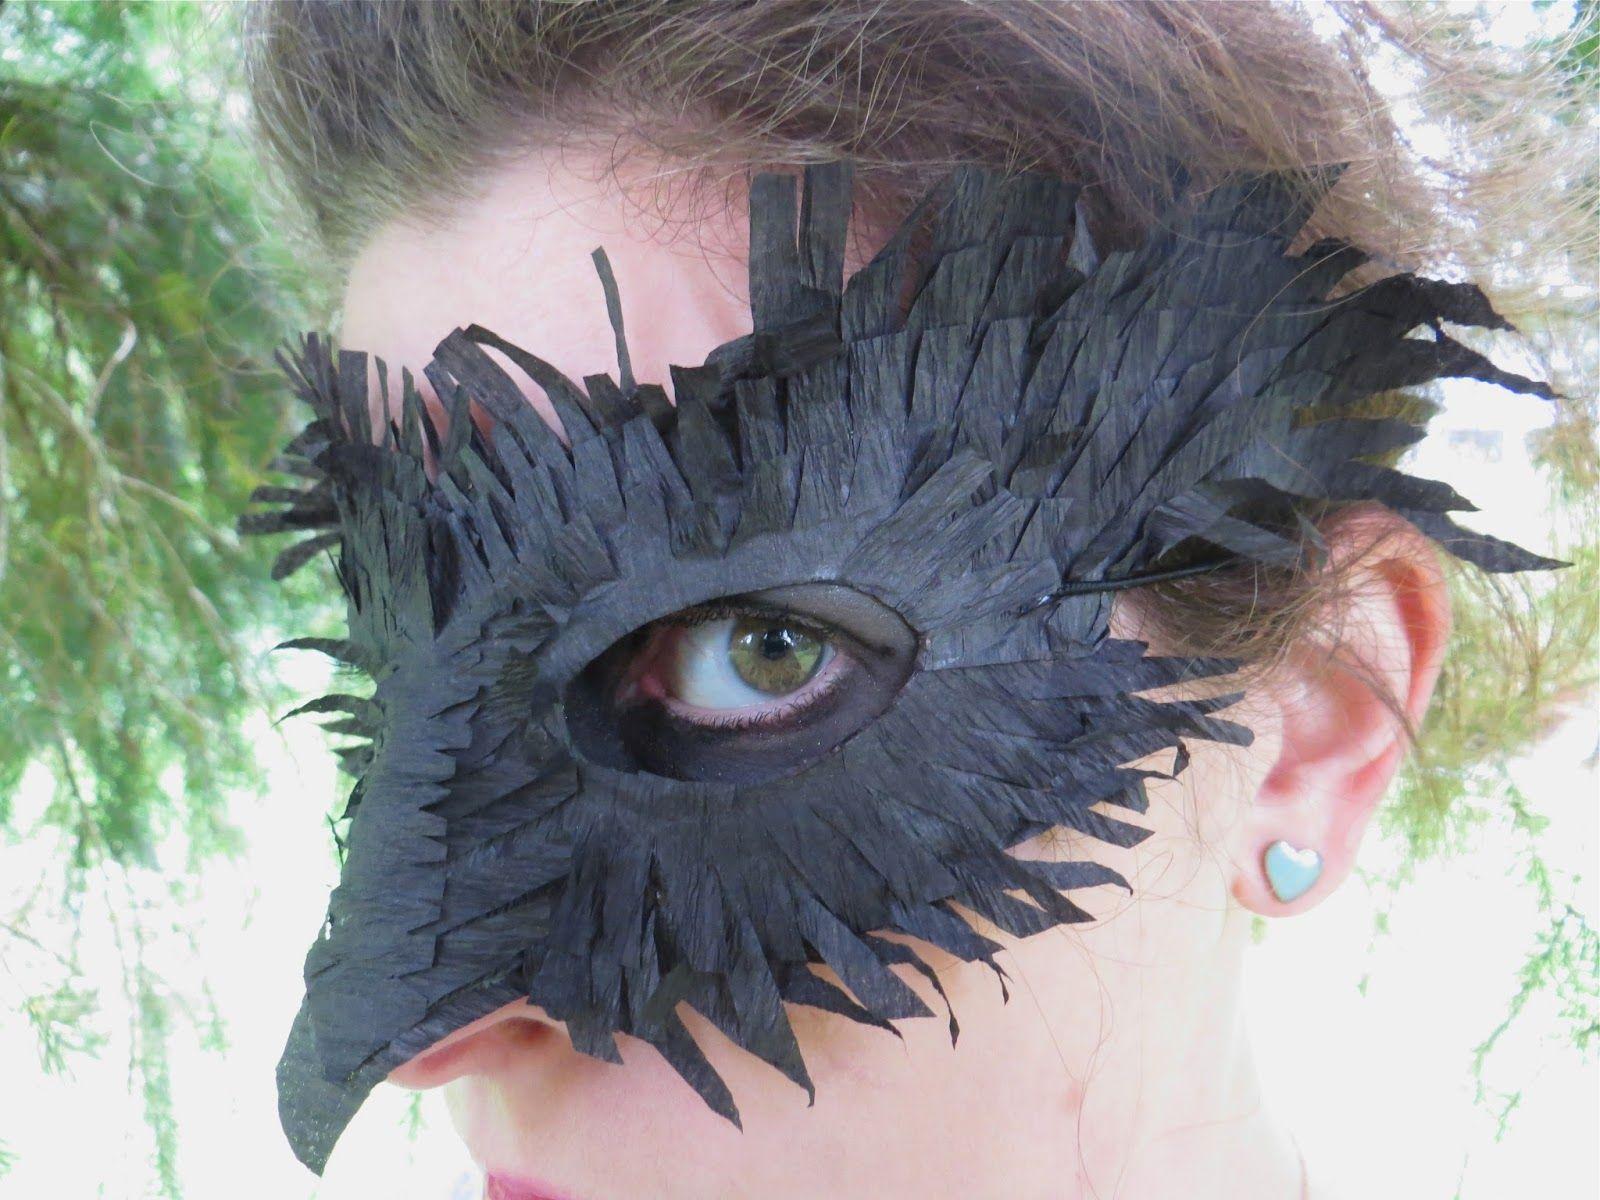 diy crow costume - Google Search | Halloween 2015 | Pinterest